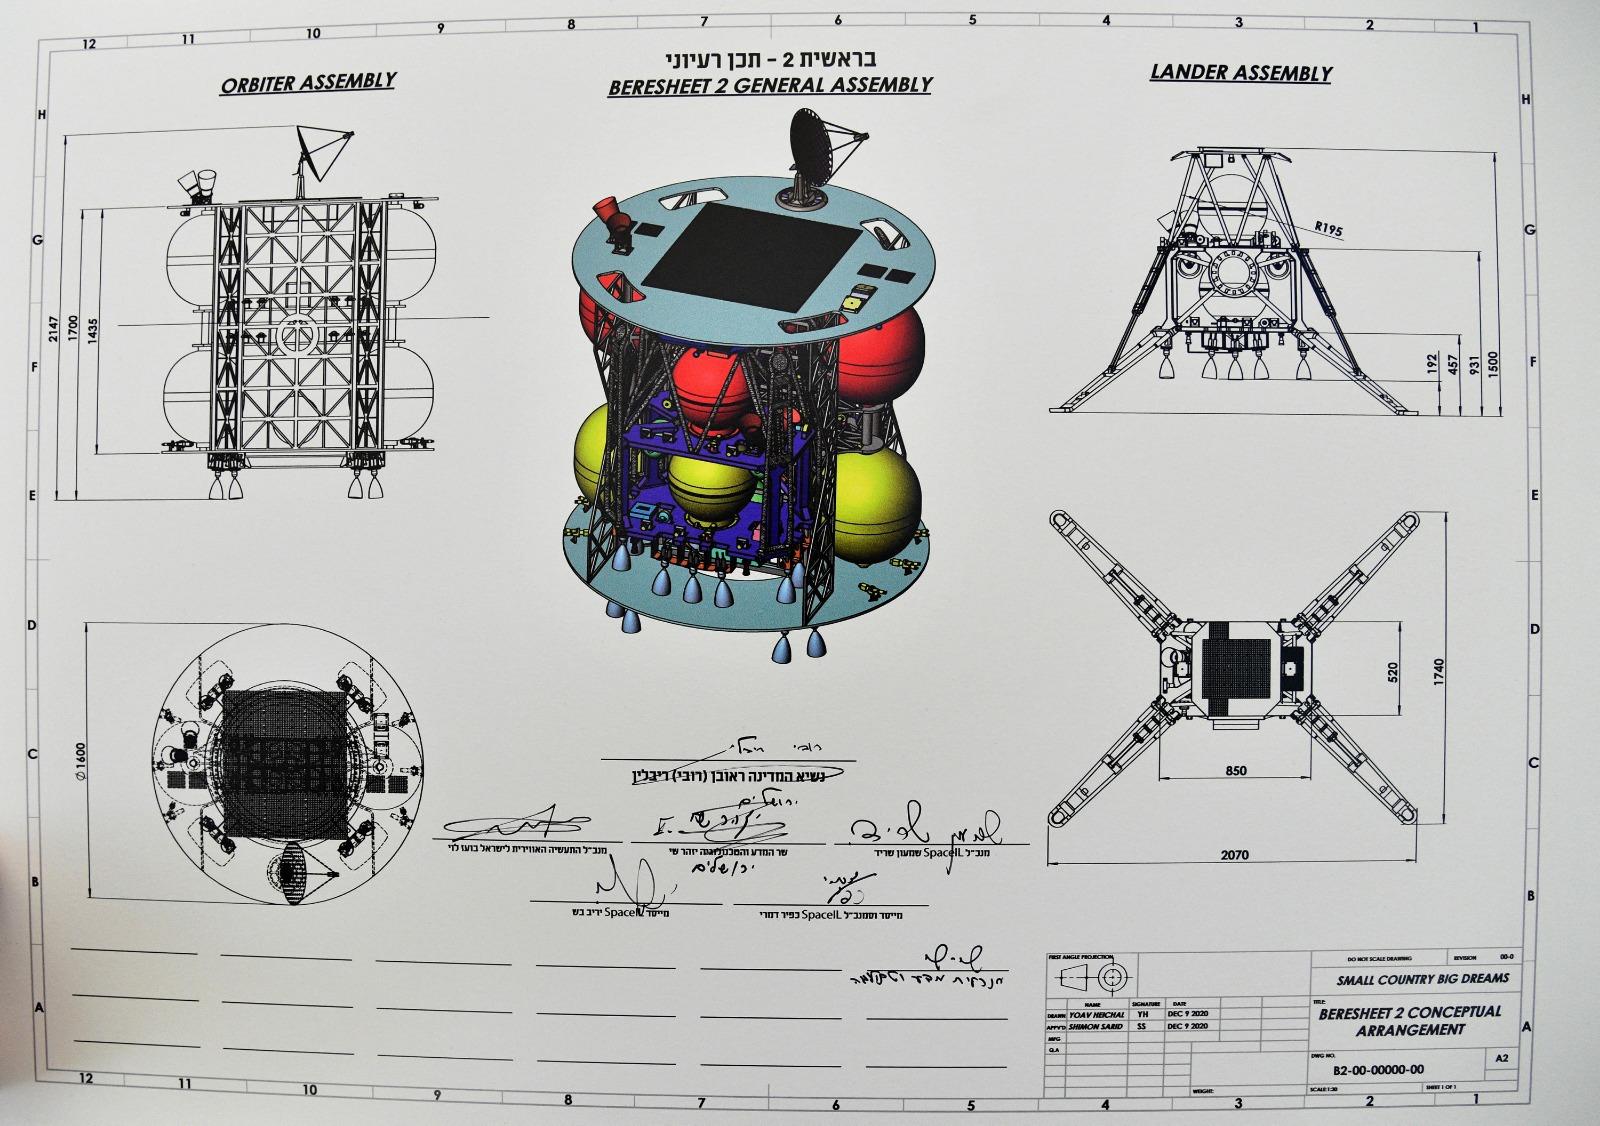 [SpaceIL] Beresheet-2 (Lune) - 2024 EozB6ZMXcAAtXgX?format=jpg&name=large